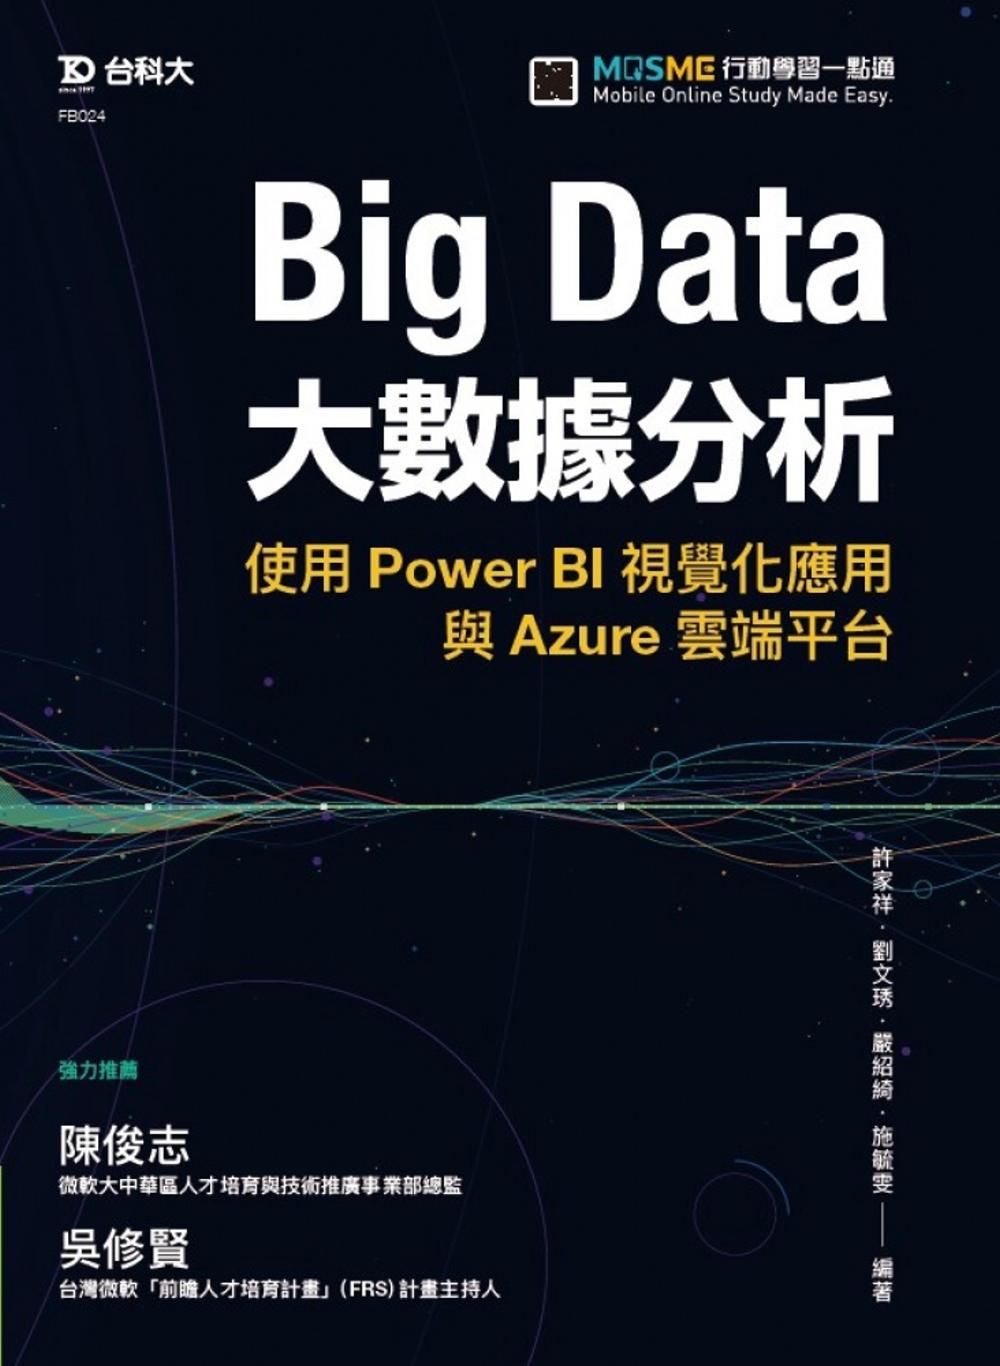 Big Data大數據分析使用...